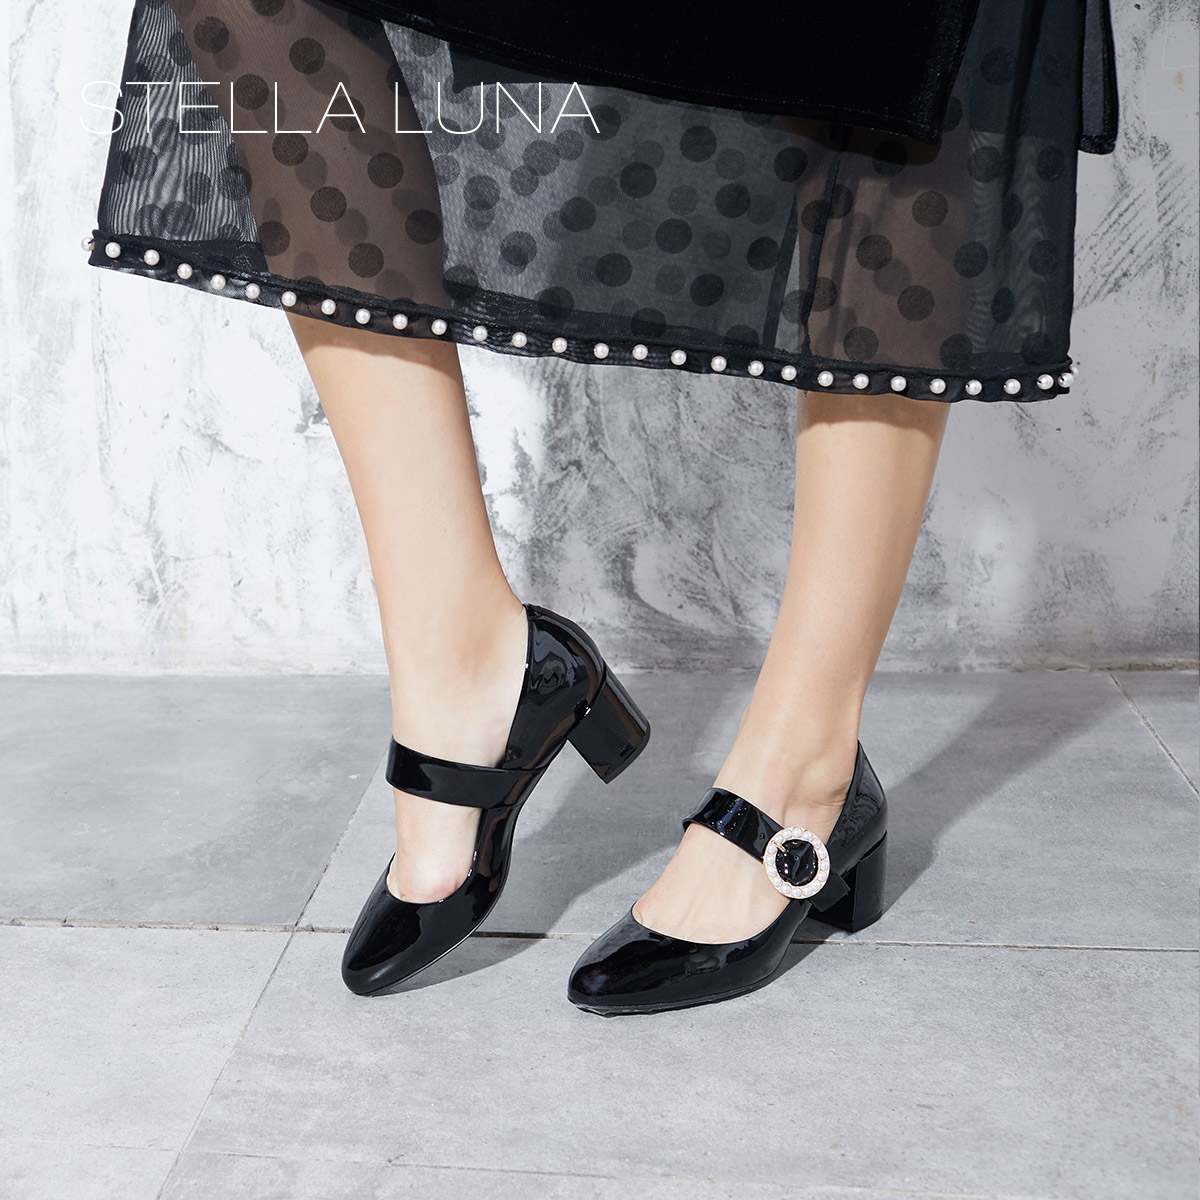 STELLA LUNA秋冬天鹅绒粗跟珍珠装饰婚鞋女士玛丽珍鞋SI133F22302